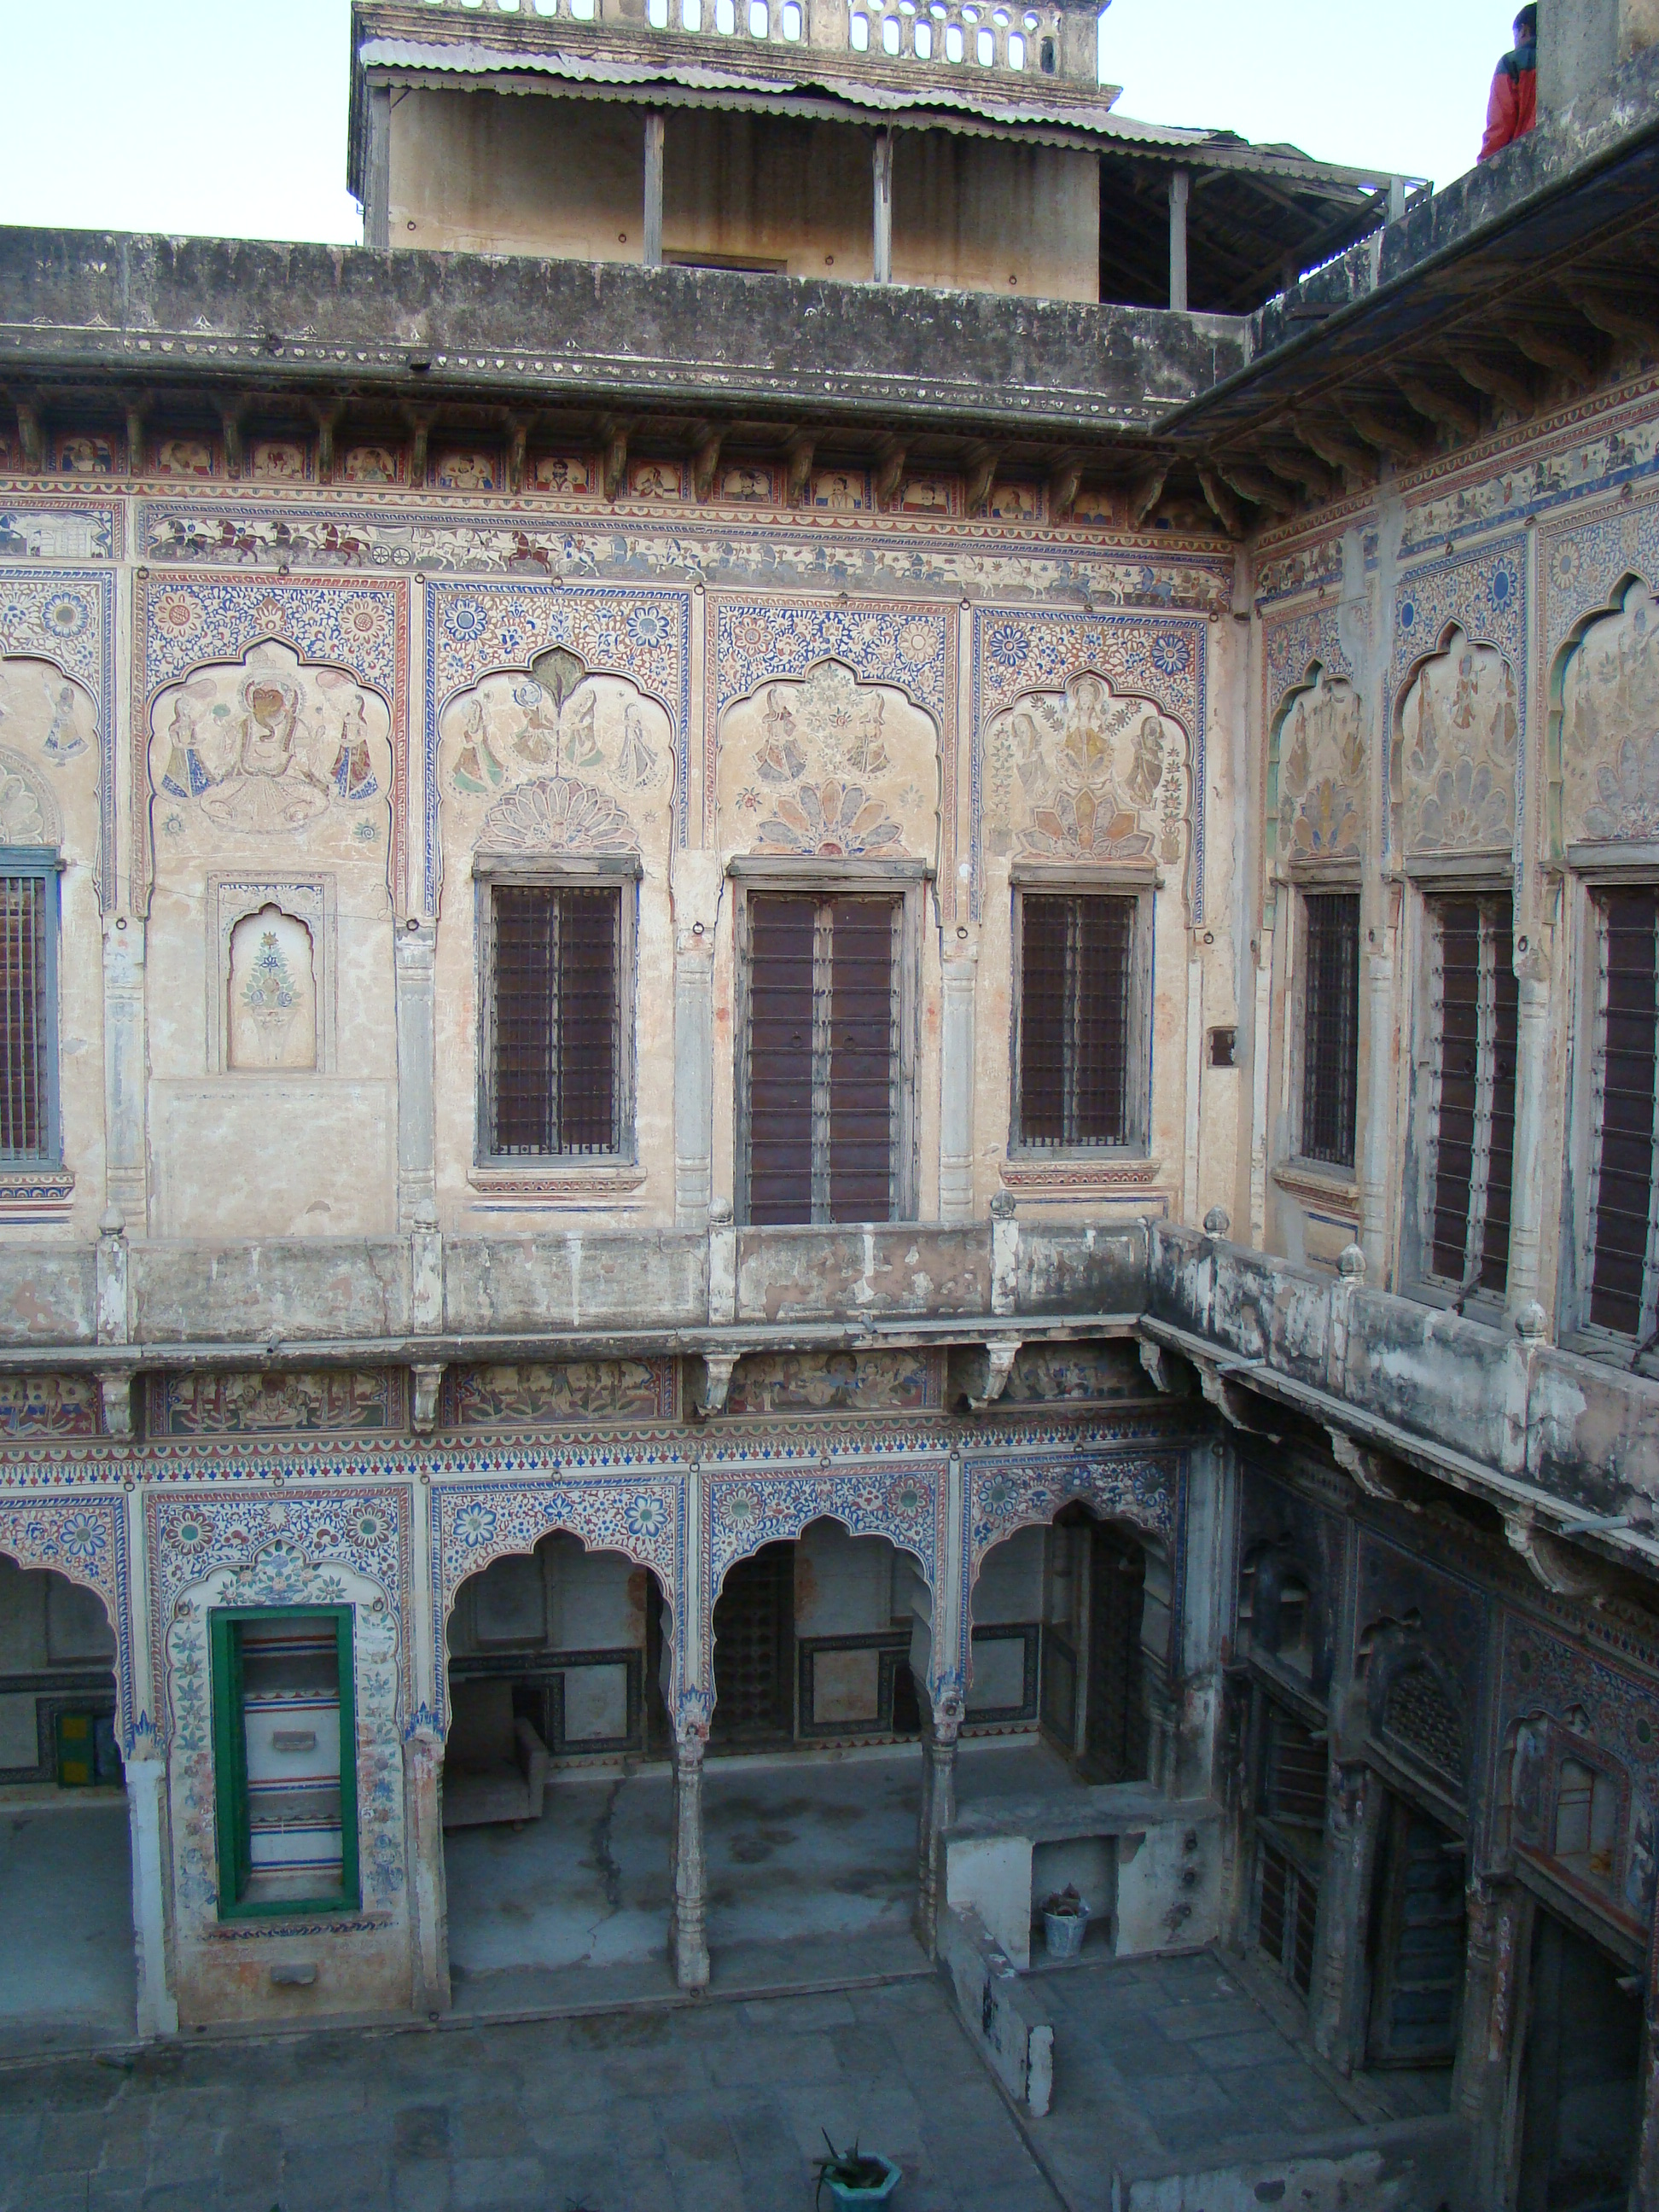 Mandawa India  city photos gallery : Description India Mandawa haveli 12 ni